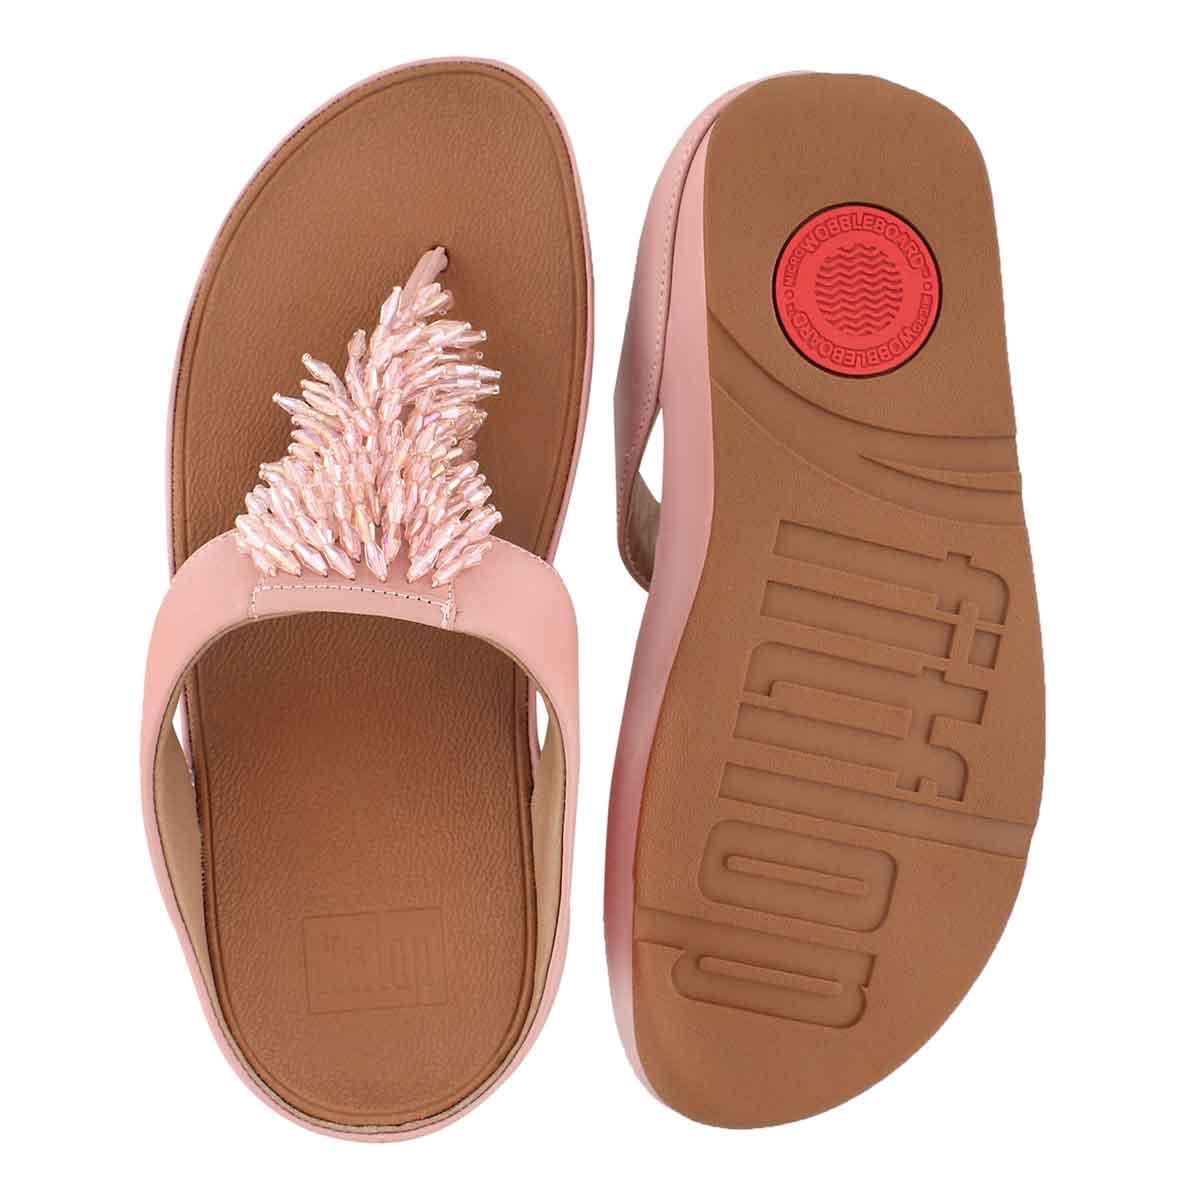 Lds Rumba dusky pnk fringe thong sandal